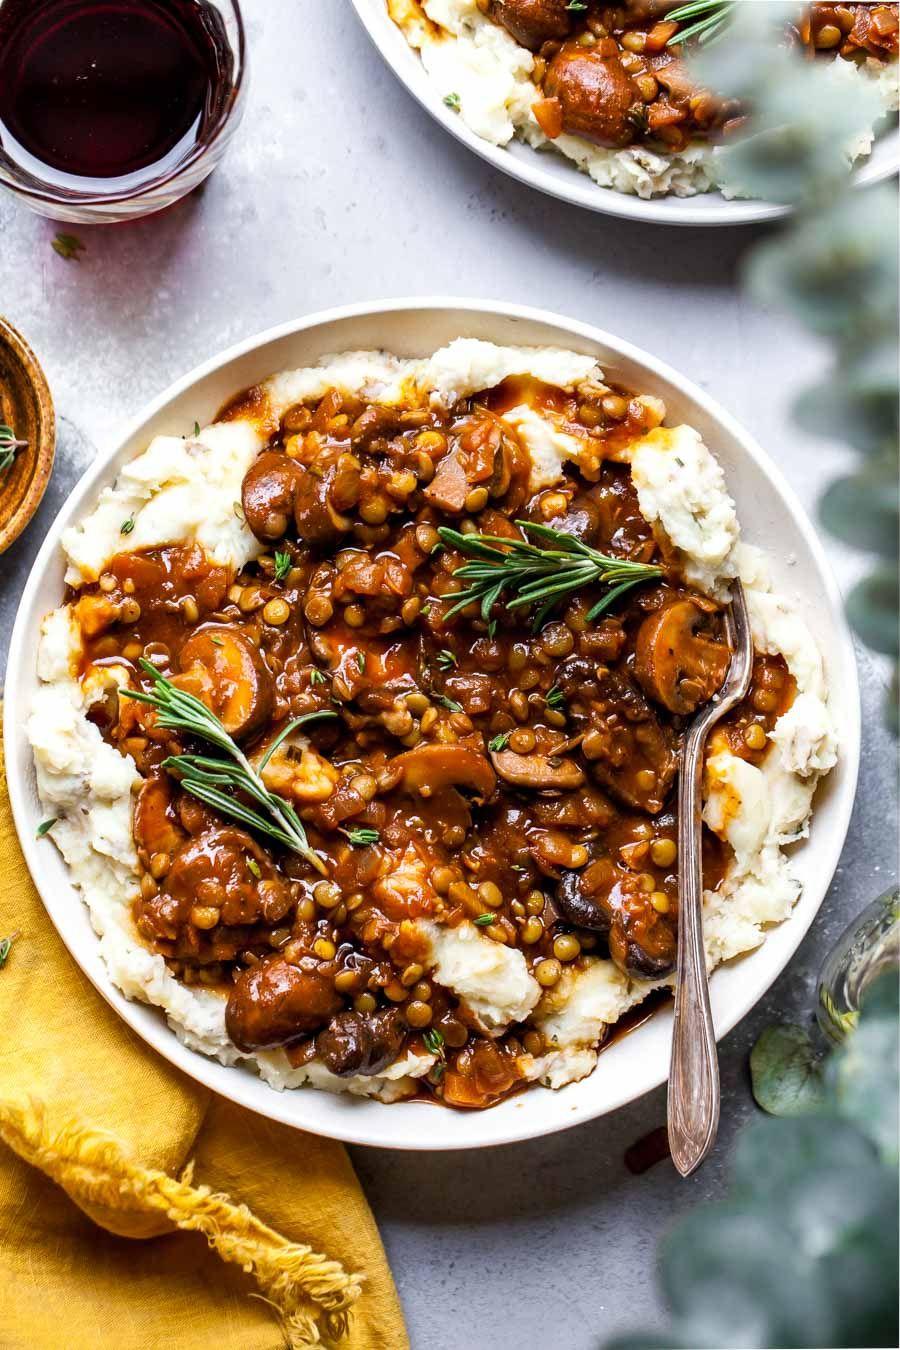 Lentil and Mushroom Stew over Potato-Parsnip Mash